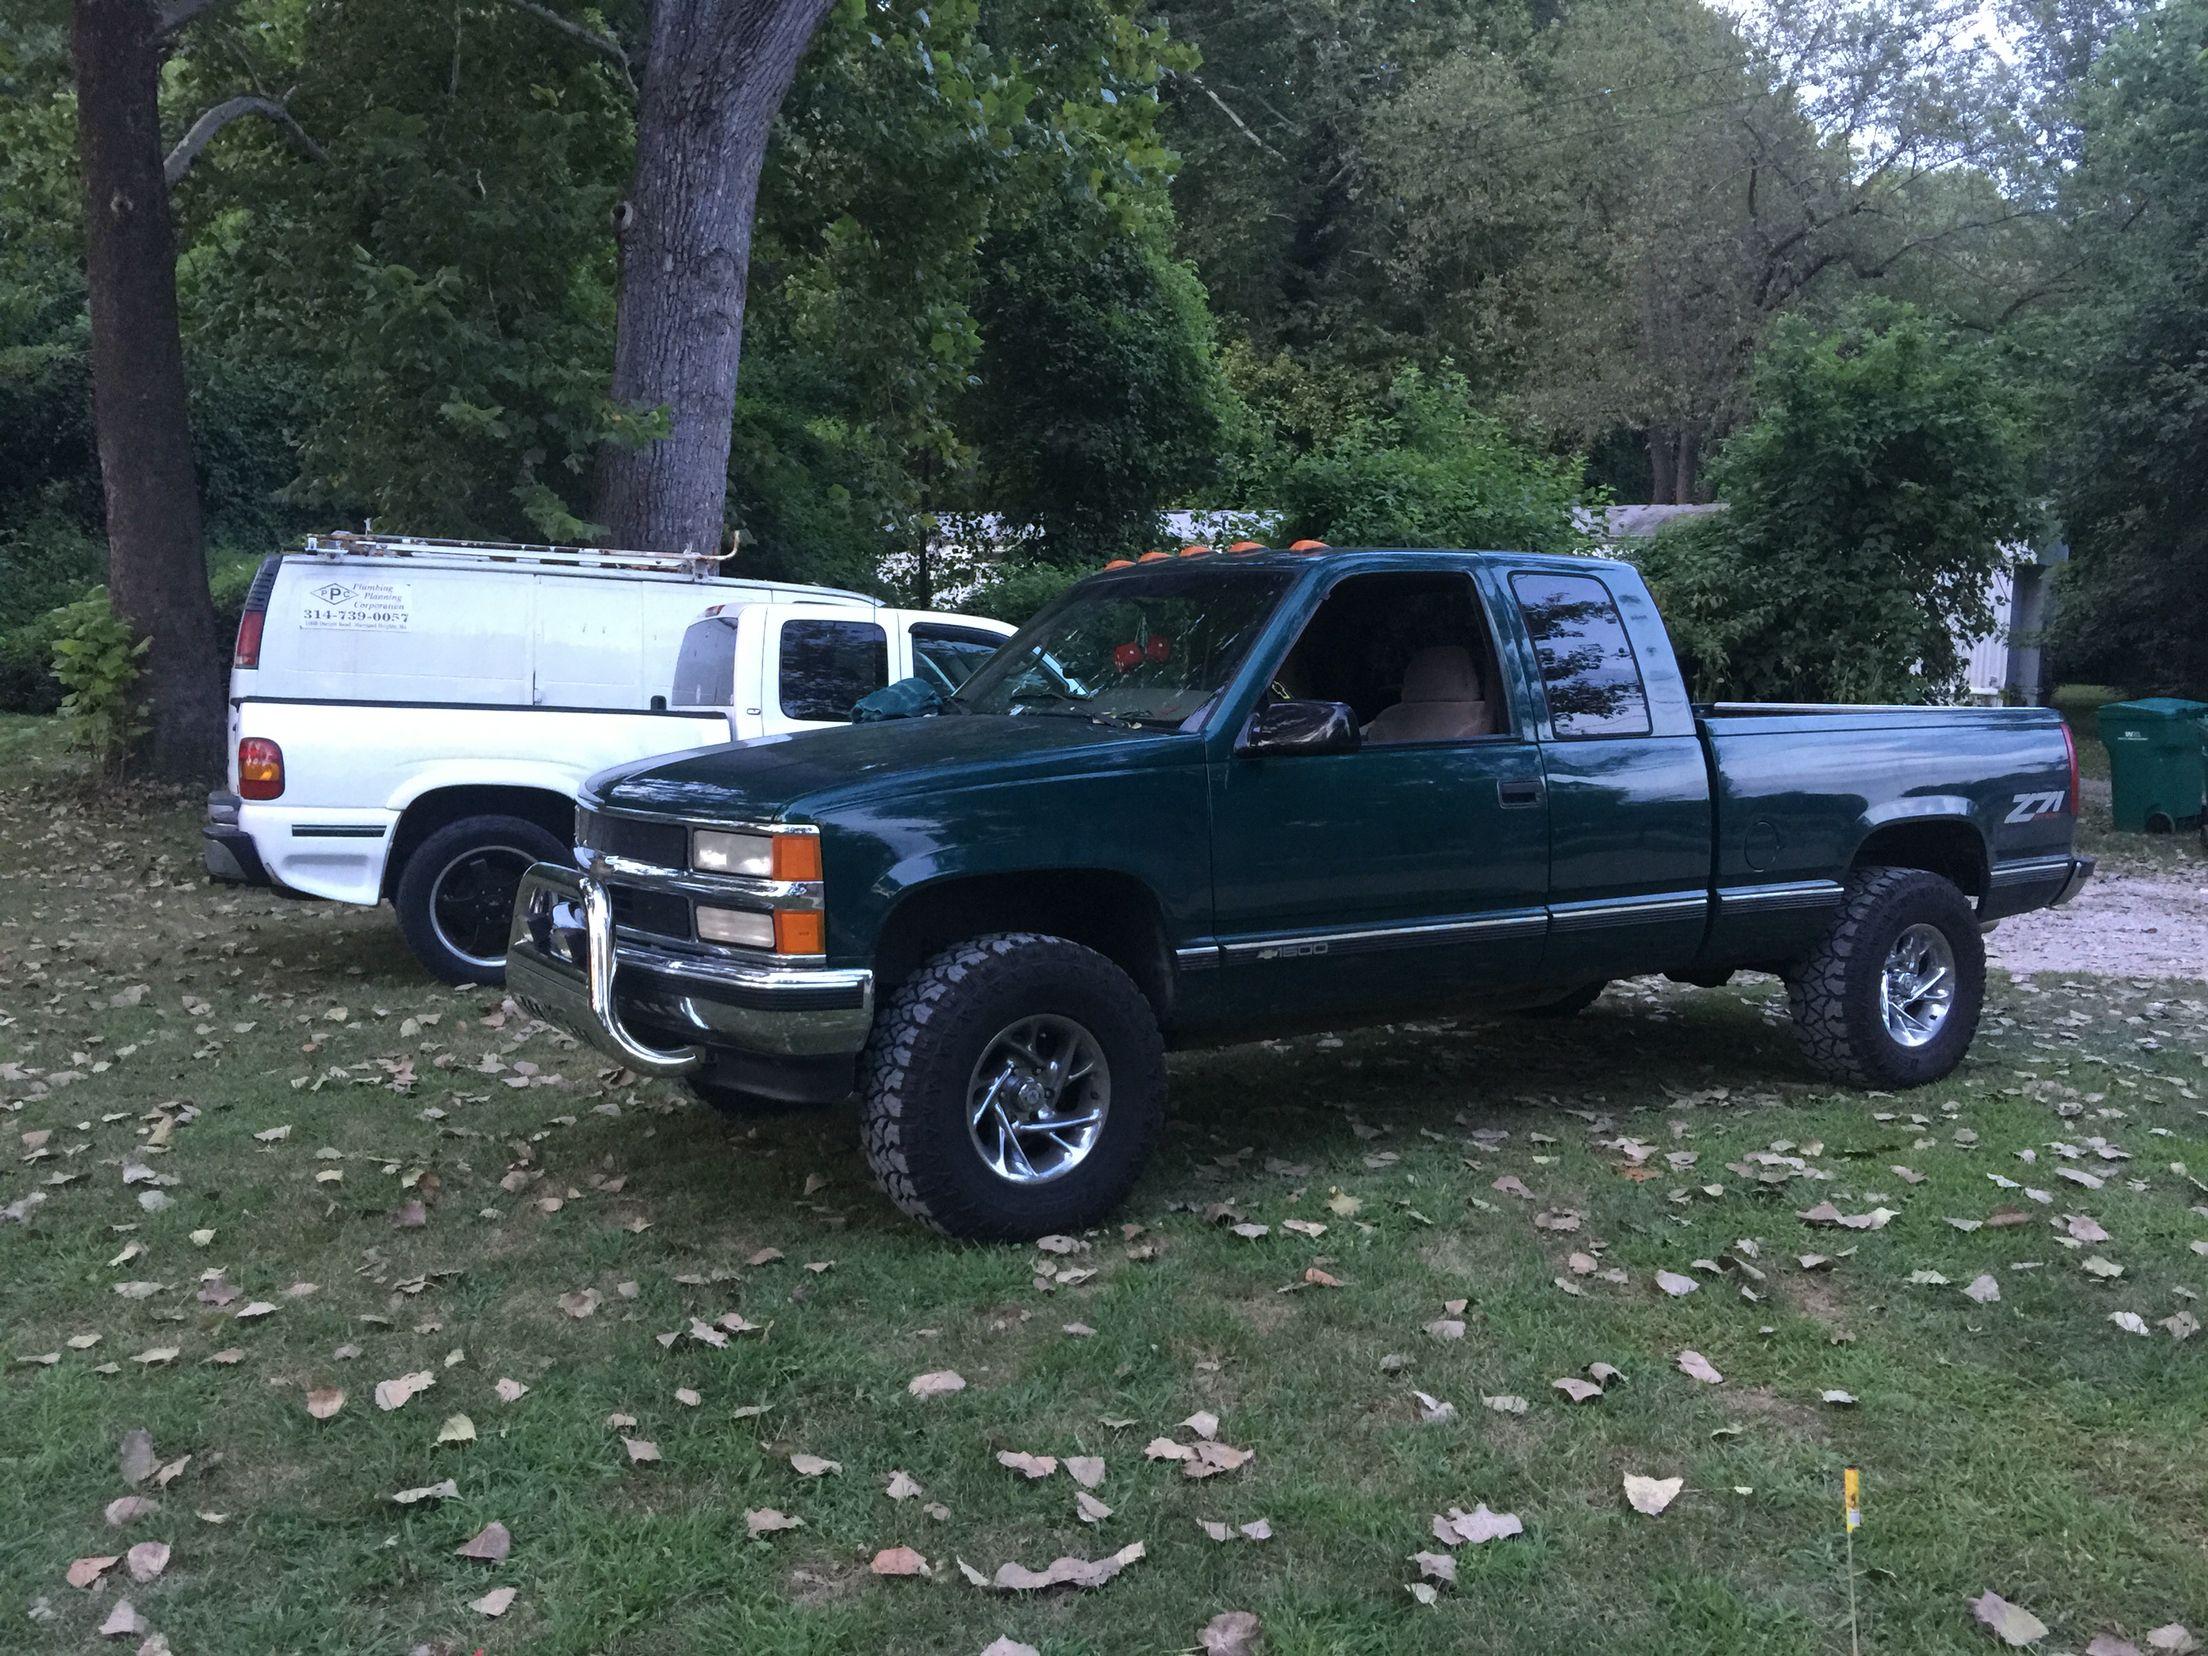 1995 k1500 silverado 33s 3 inch lift lifted chevy trucks chevrolet trucks chevy silverado [ 2208 x 1656 Pixel ]